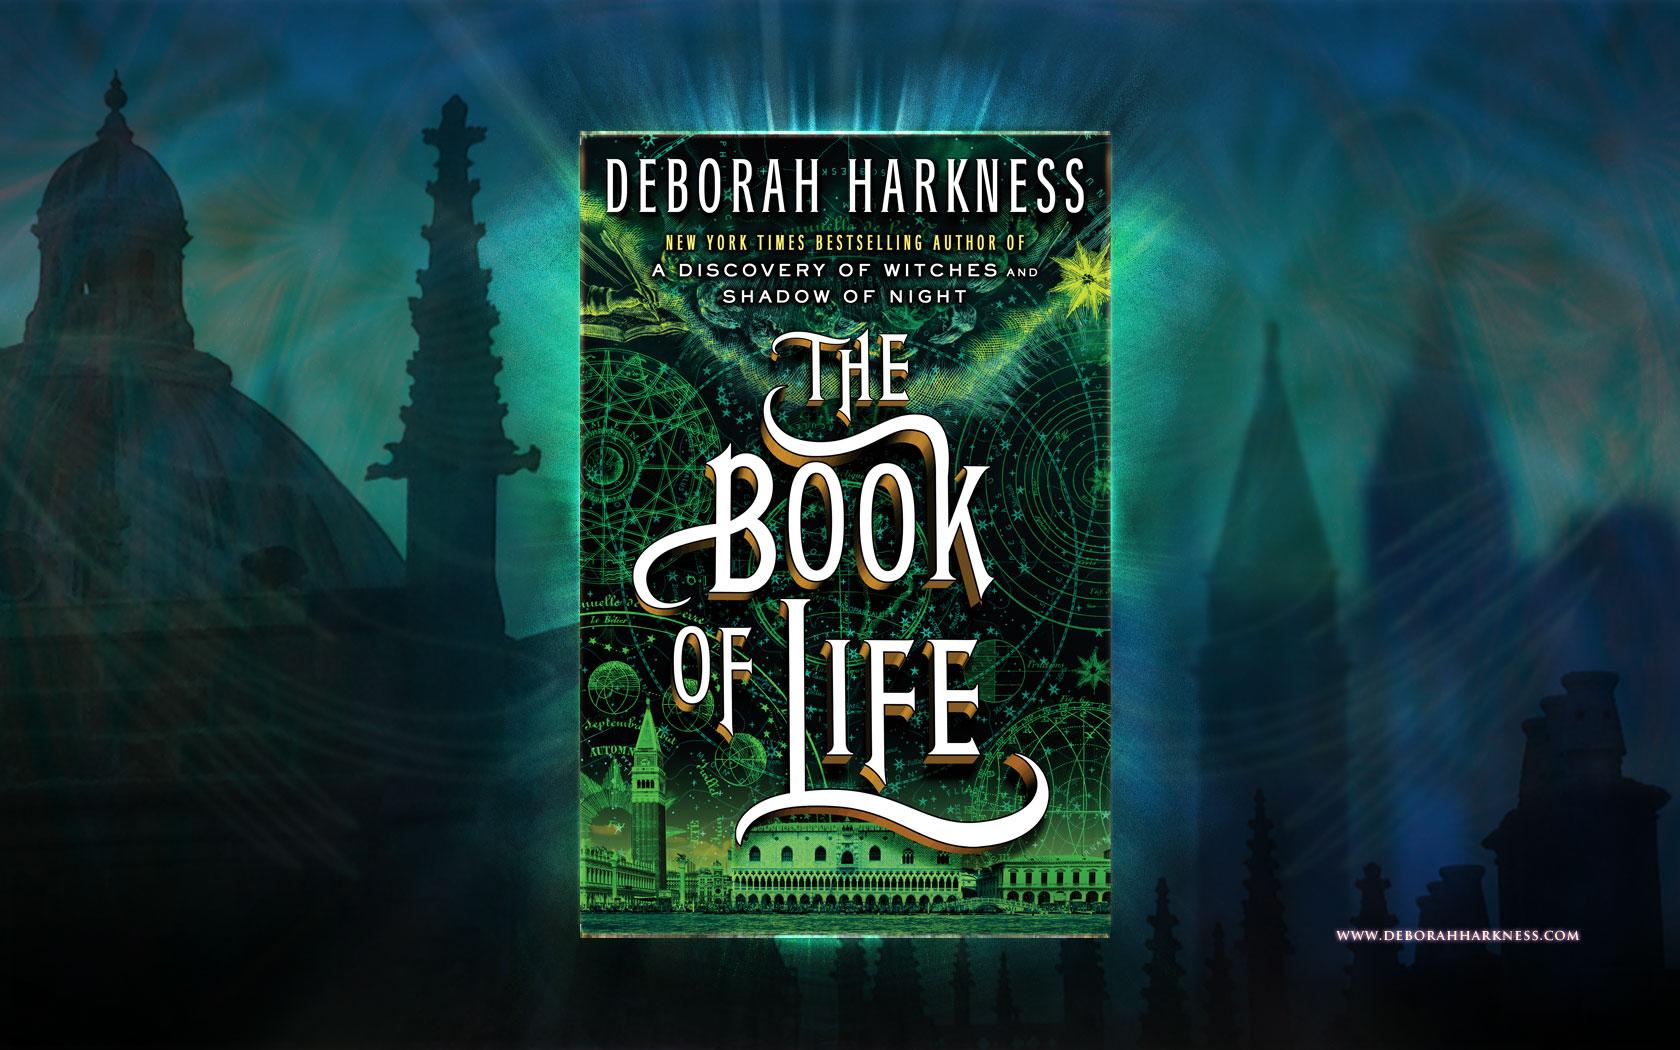 The Book of Life (Desktop Wallpaper)